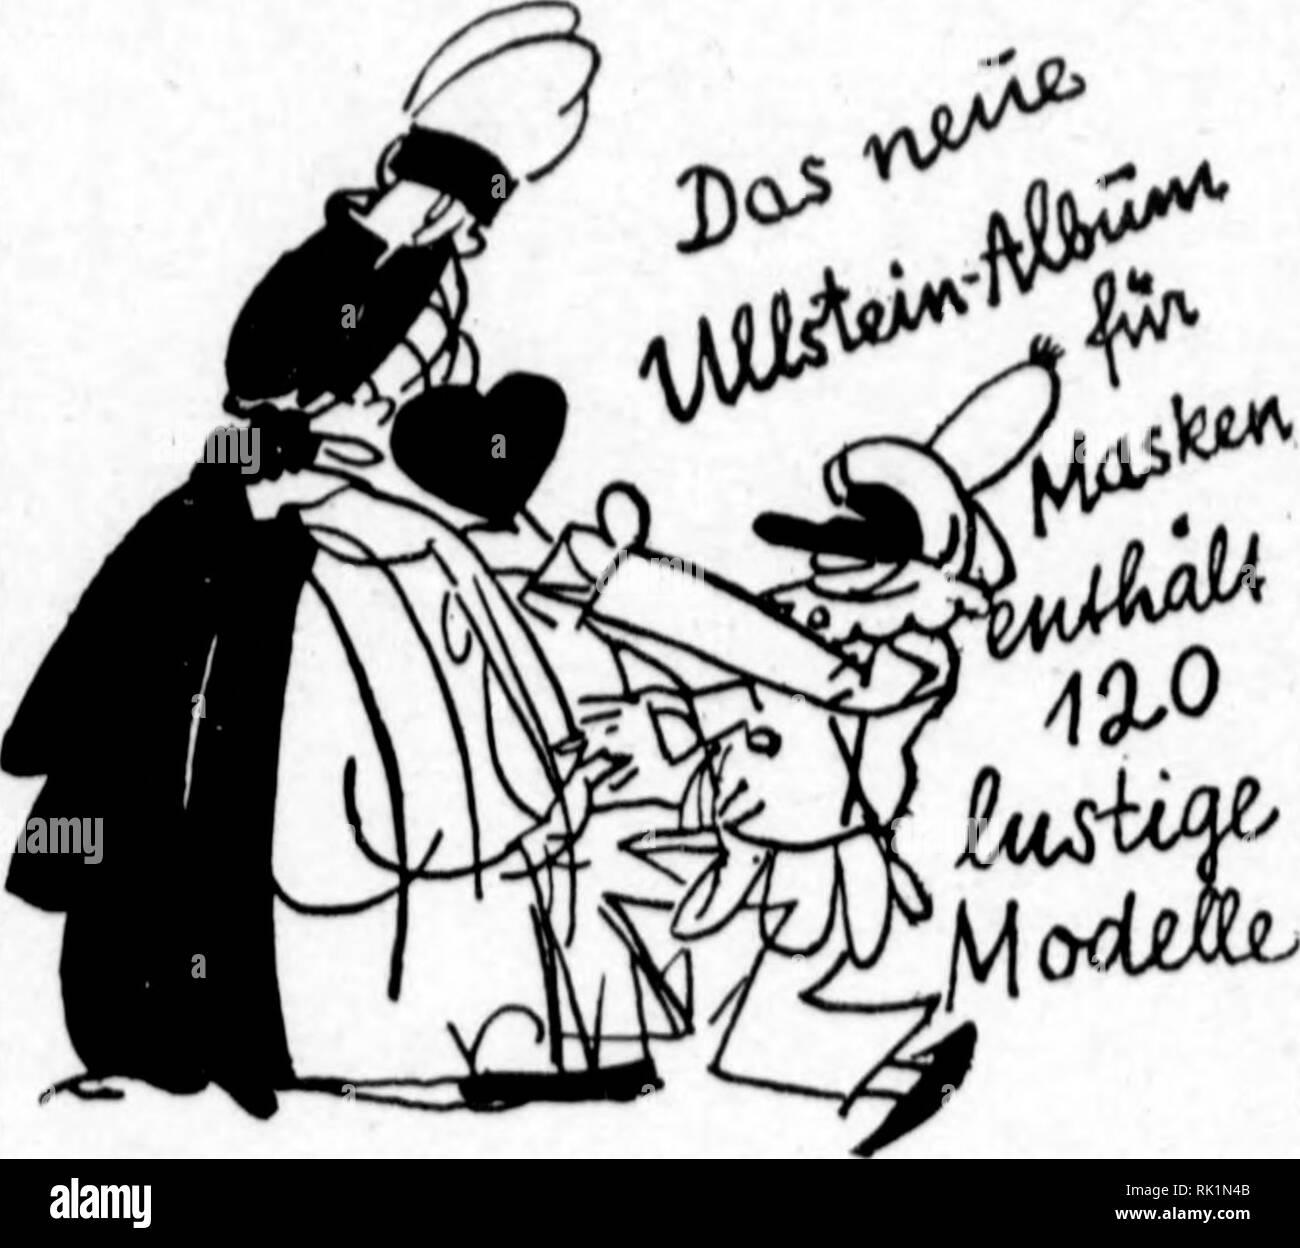 . Arthur and Fritz Kahn Collection 1889-1932. Kahn, Fritz 1888-1968; Kahn, Arthur David 1850-1928; Natural history illustrators; Natural history. 172 9lr. (J 3^obc6ftrafc für ^affectrinfer* Söie bot SDfcffa 511 unö fam. ä> ü n S V i fe it a l) n. eo HoiU in bei* ^IJntur t)06 ü)IiMi d)on, bnö '•Bc- fteI)cnbo als fcIbftucrftänMtd) uiib C>oö l)cute i>oir- fd)cnbc alö feit Urzeit barteu)ofcn ^u botrod)ton. 9iicnianb bcntt bnrnn, luenn er fid) inori^oiu^ bcii SÖinntel .vitnöpft, bn^ bie (Sifinbuiui bcö ^iiopfoa einmnl ein ^ortfd)ritt erfton ^Jiniuu'ö ticiüofiMi ift; !oin OJUMifd) nl)nt, lu - Stock Image